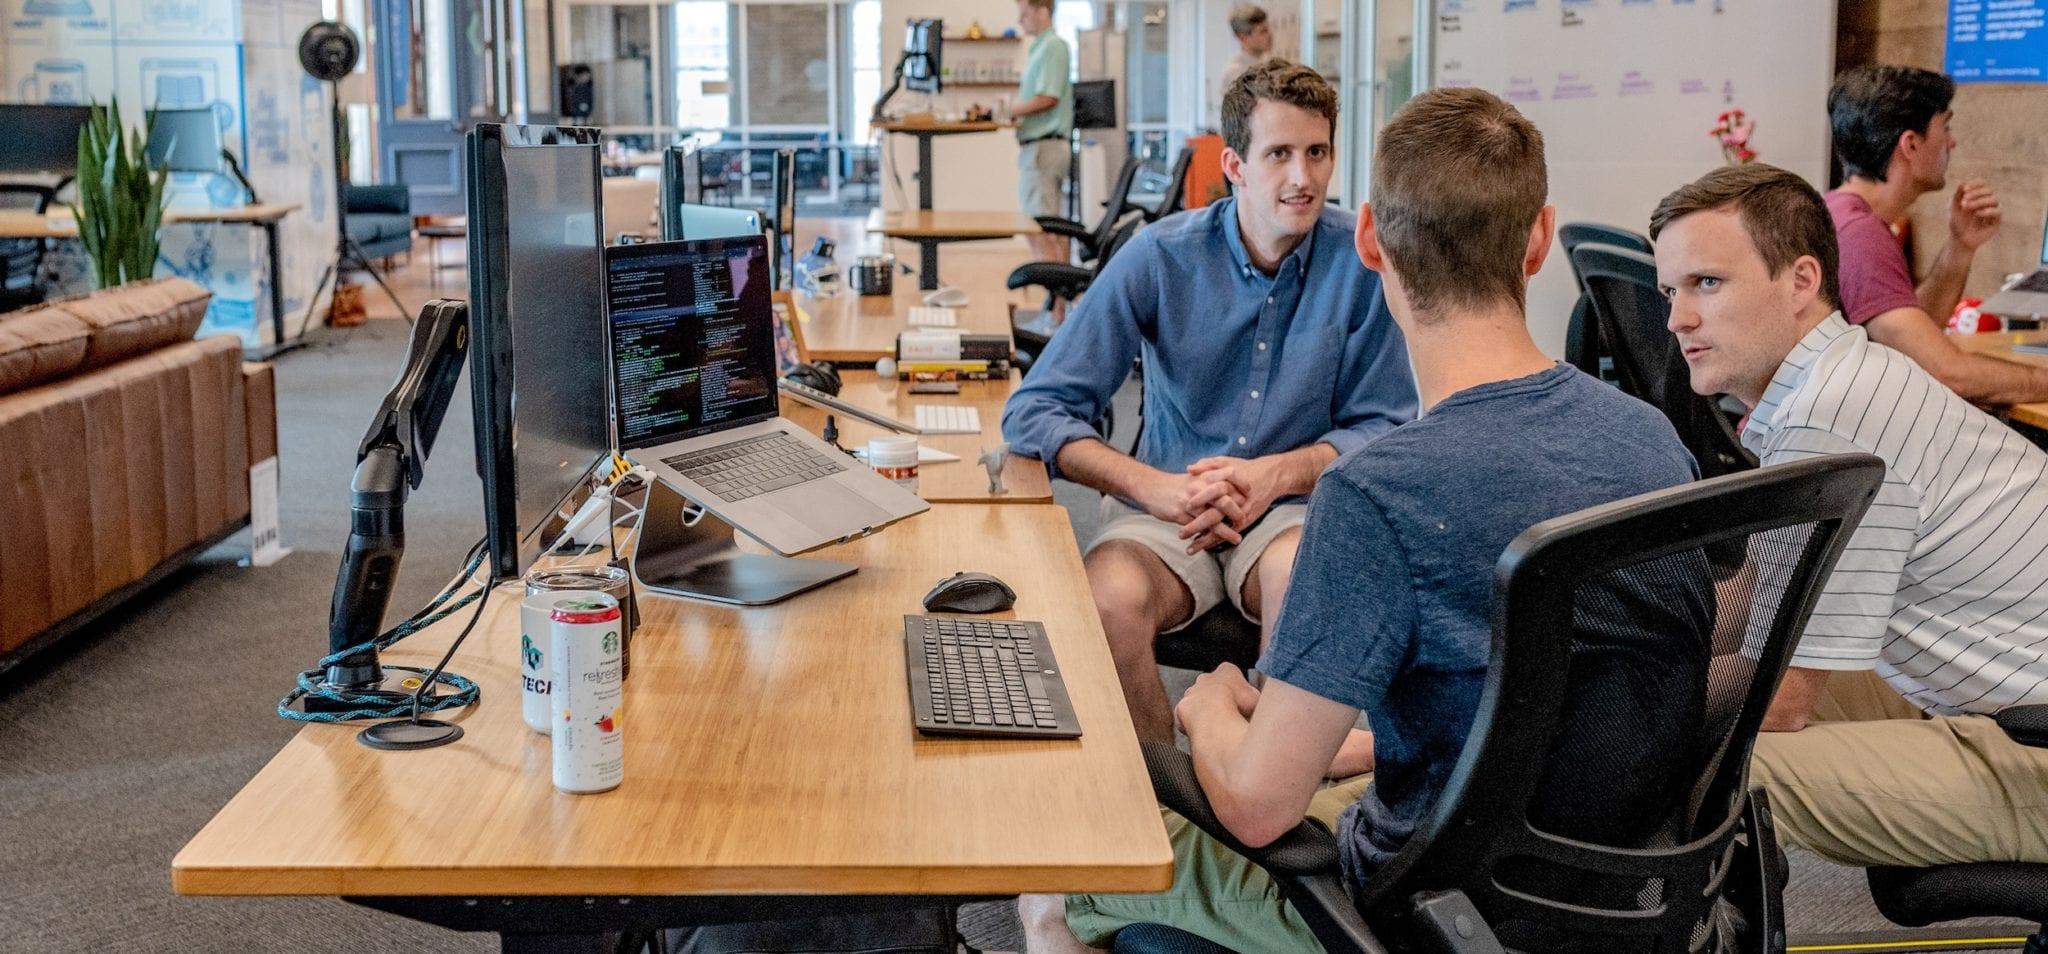 Client Success Team Meeting